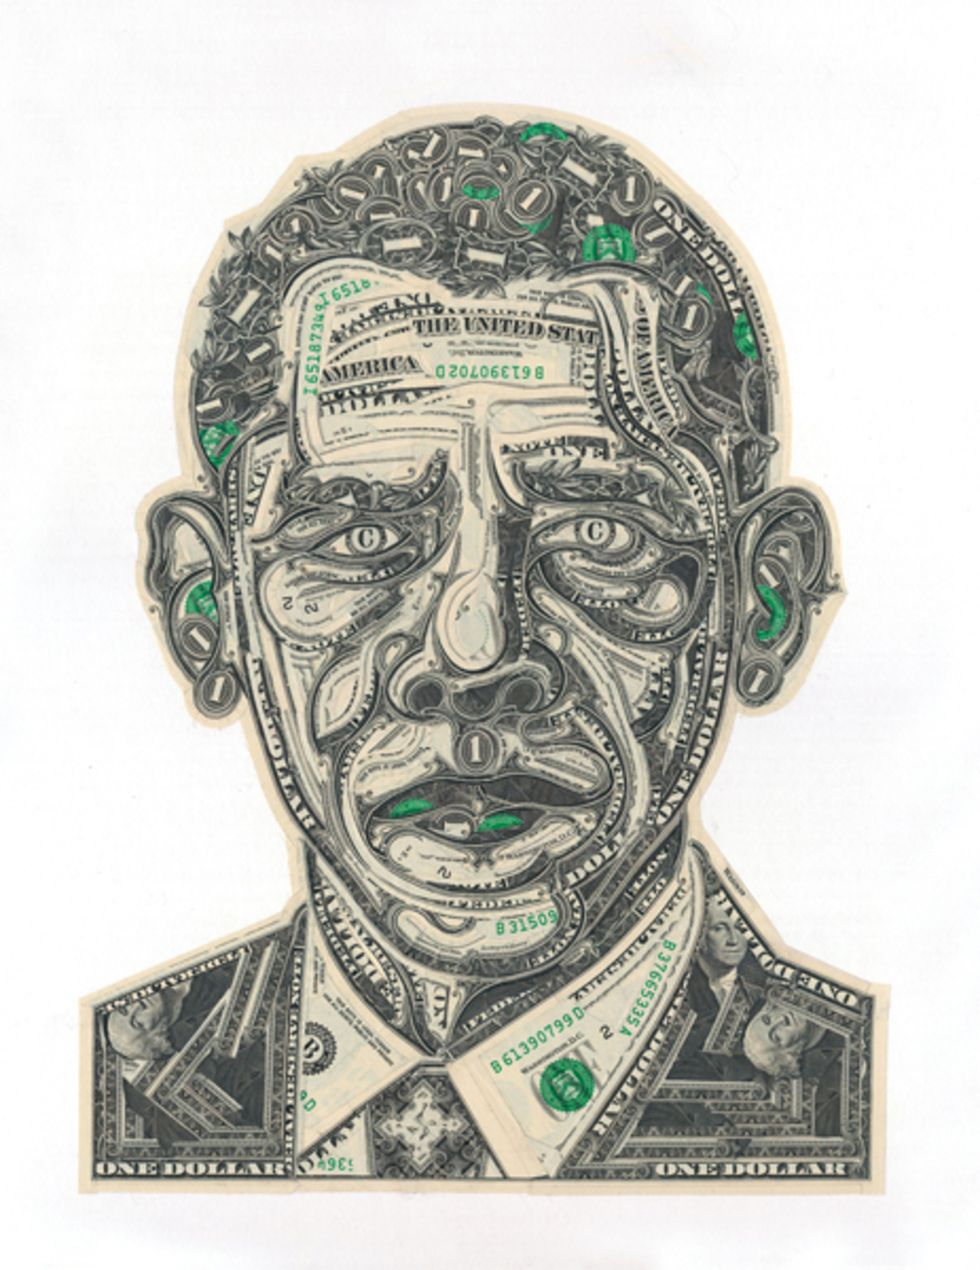 An Artist Transforms Shredded George Washingtons Into Barack Obama